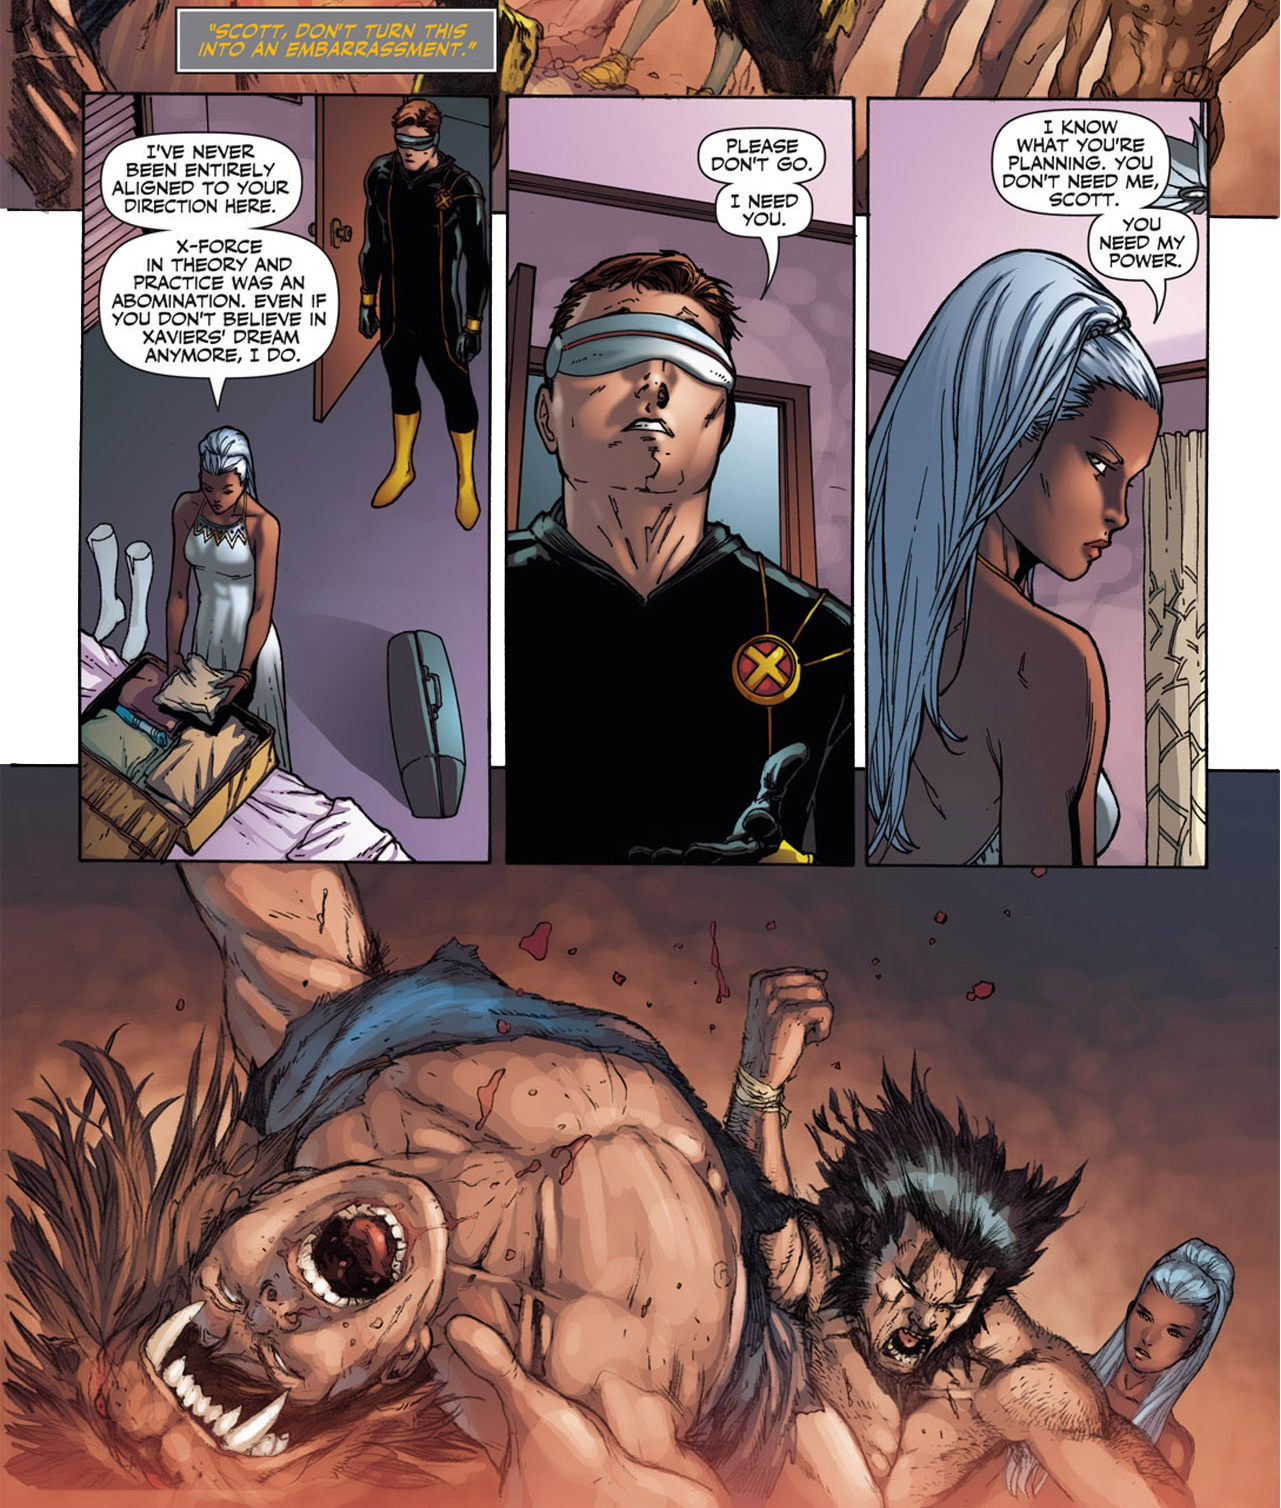 how cyclops got storm to stay in utopia